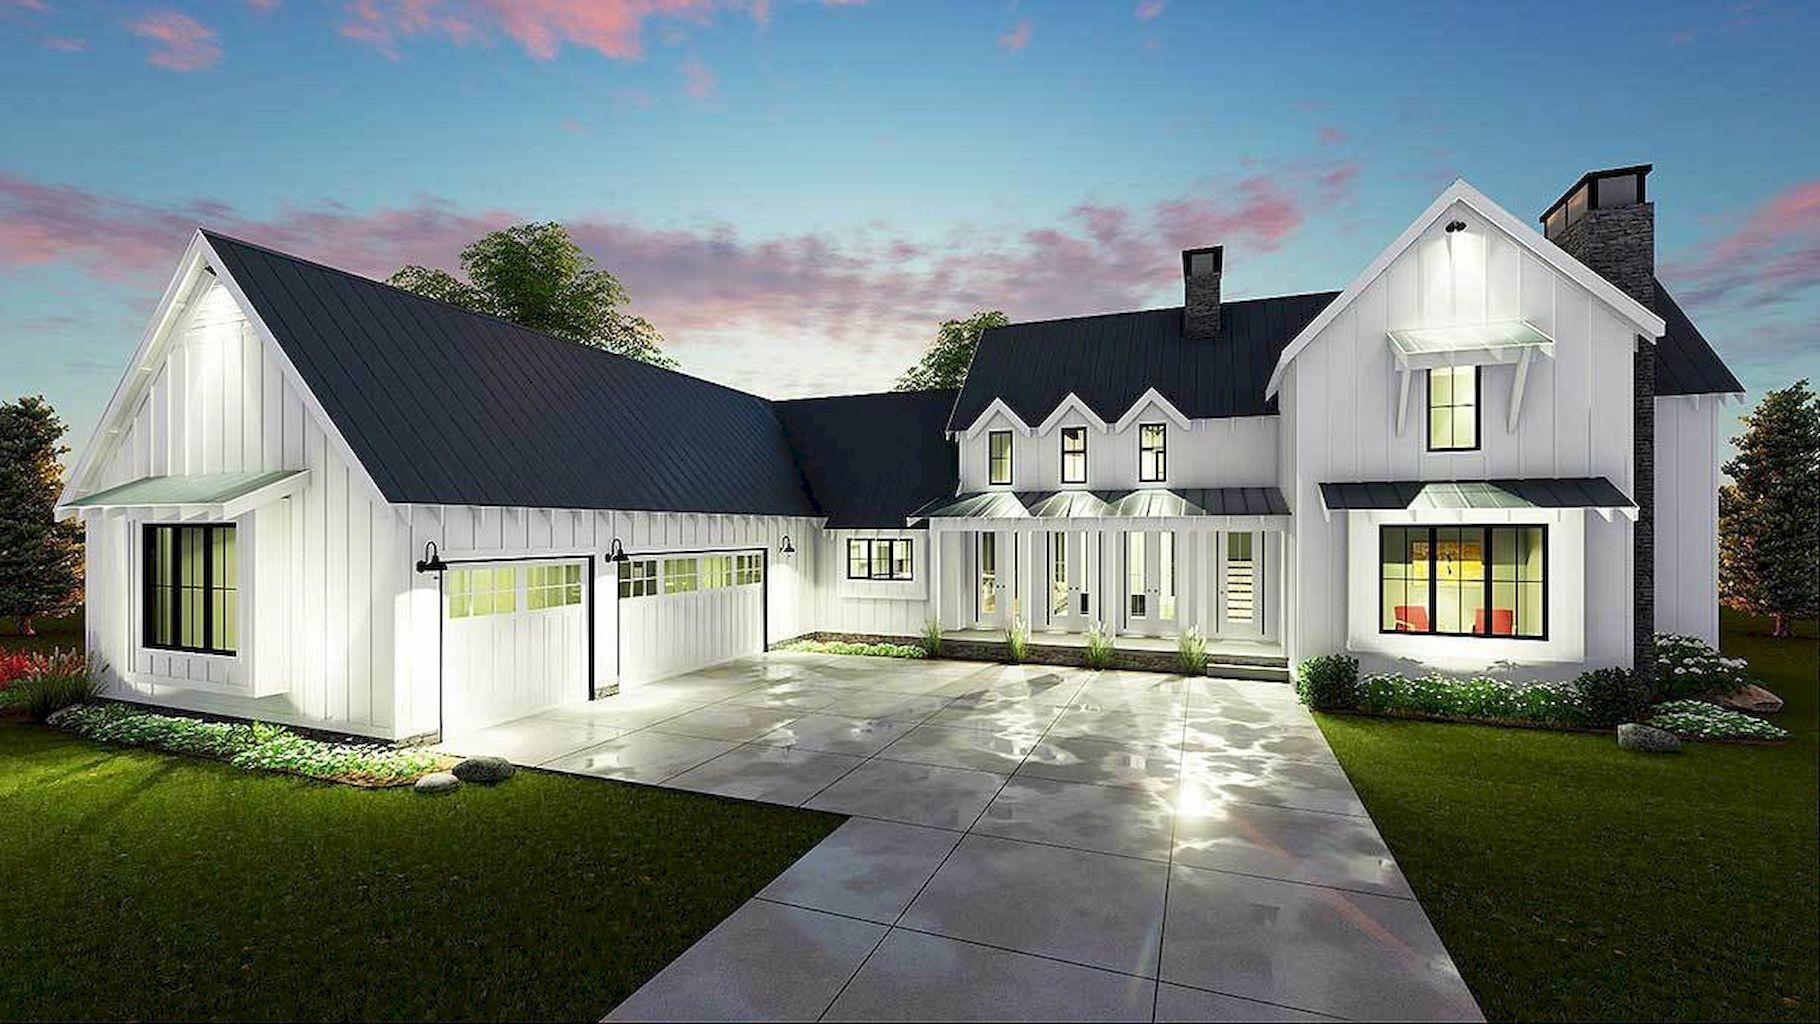 45 beautiful modern farmhouse exterior ideas modern on beautiful modern farmhouse trending exterior design ideas id=55773